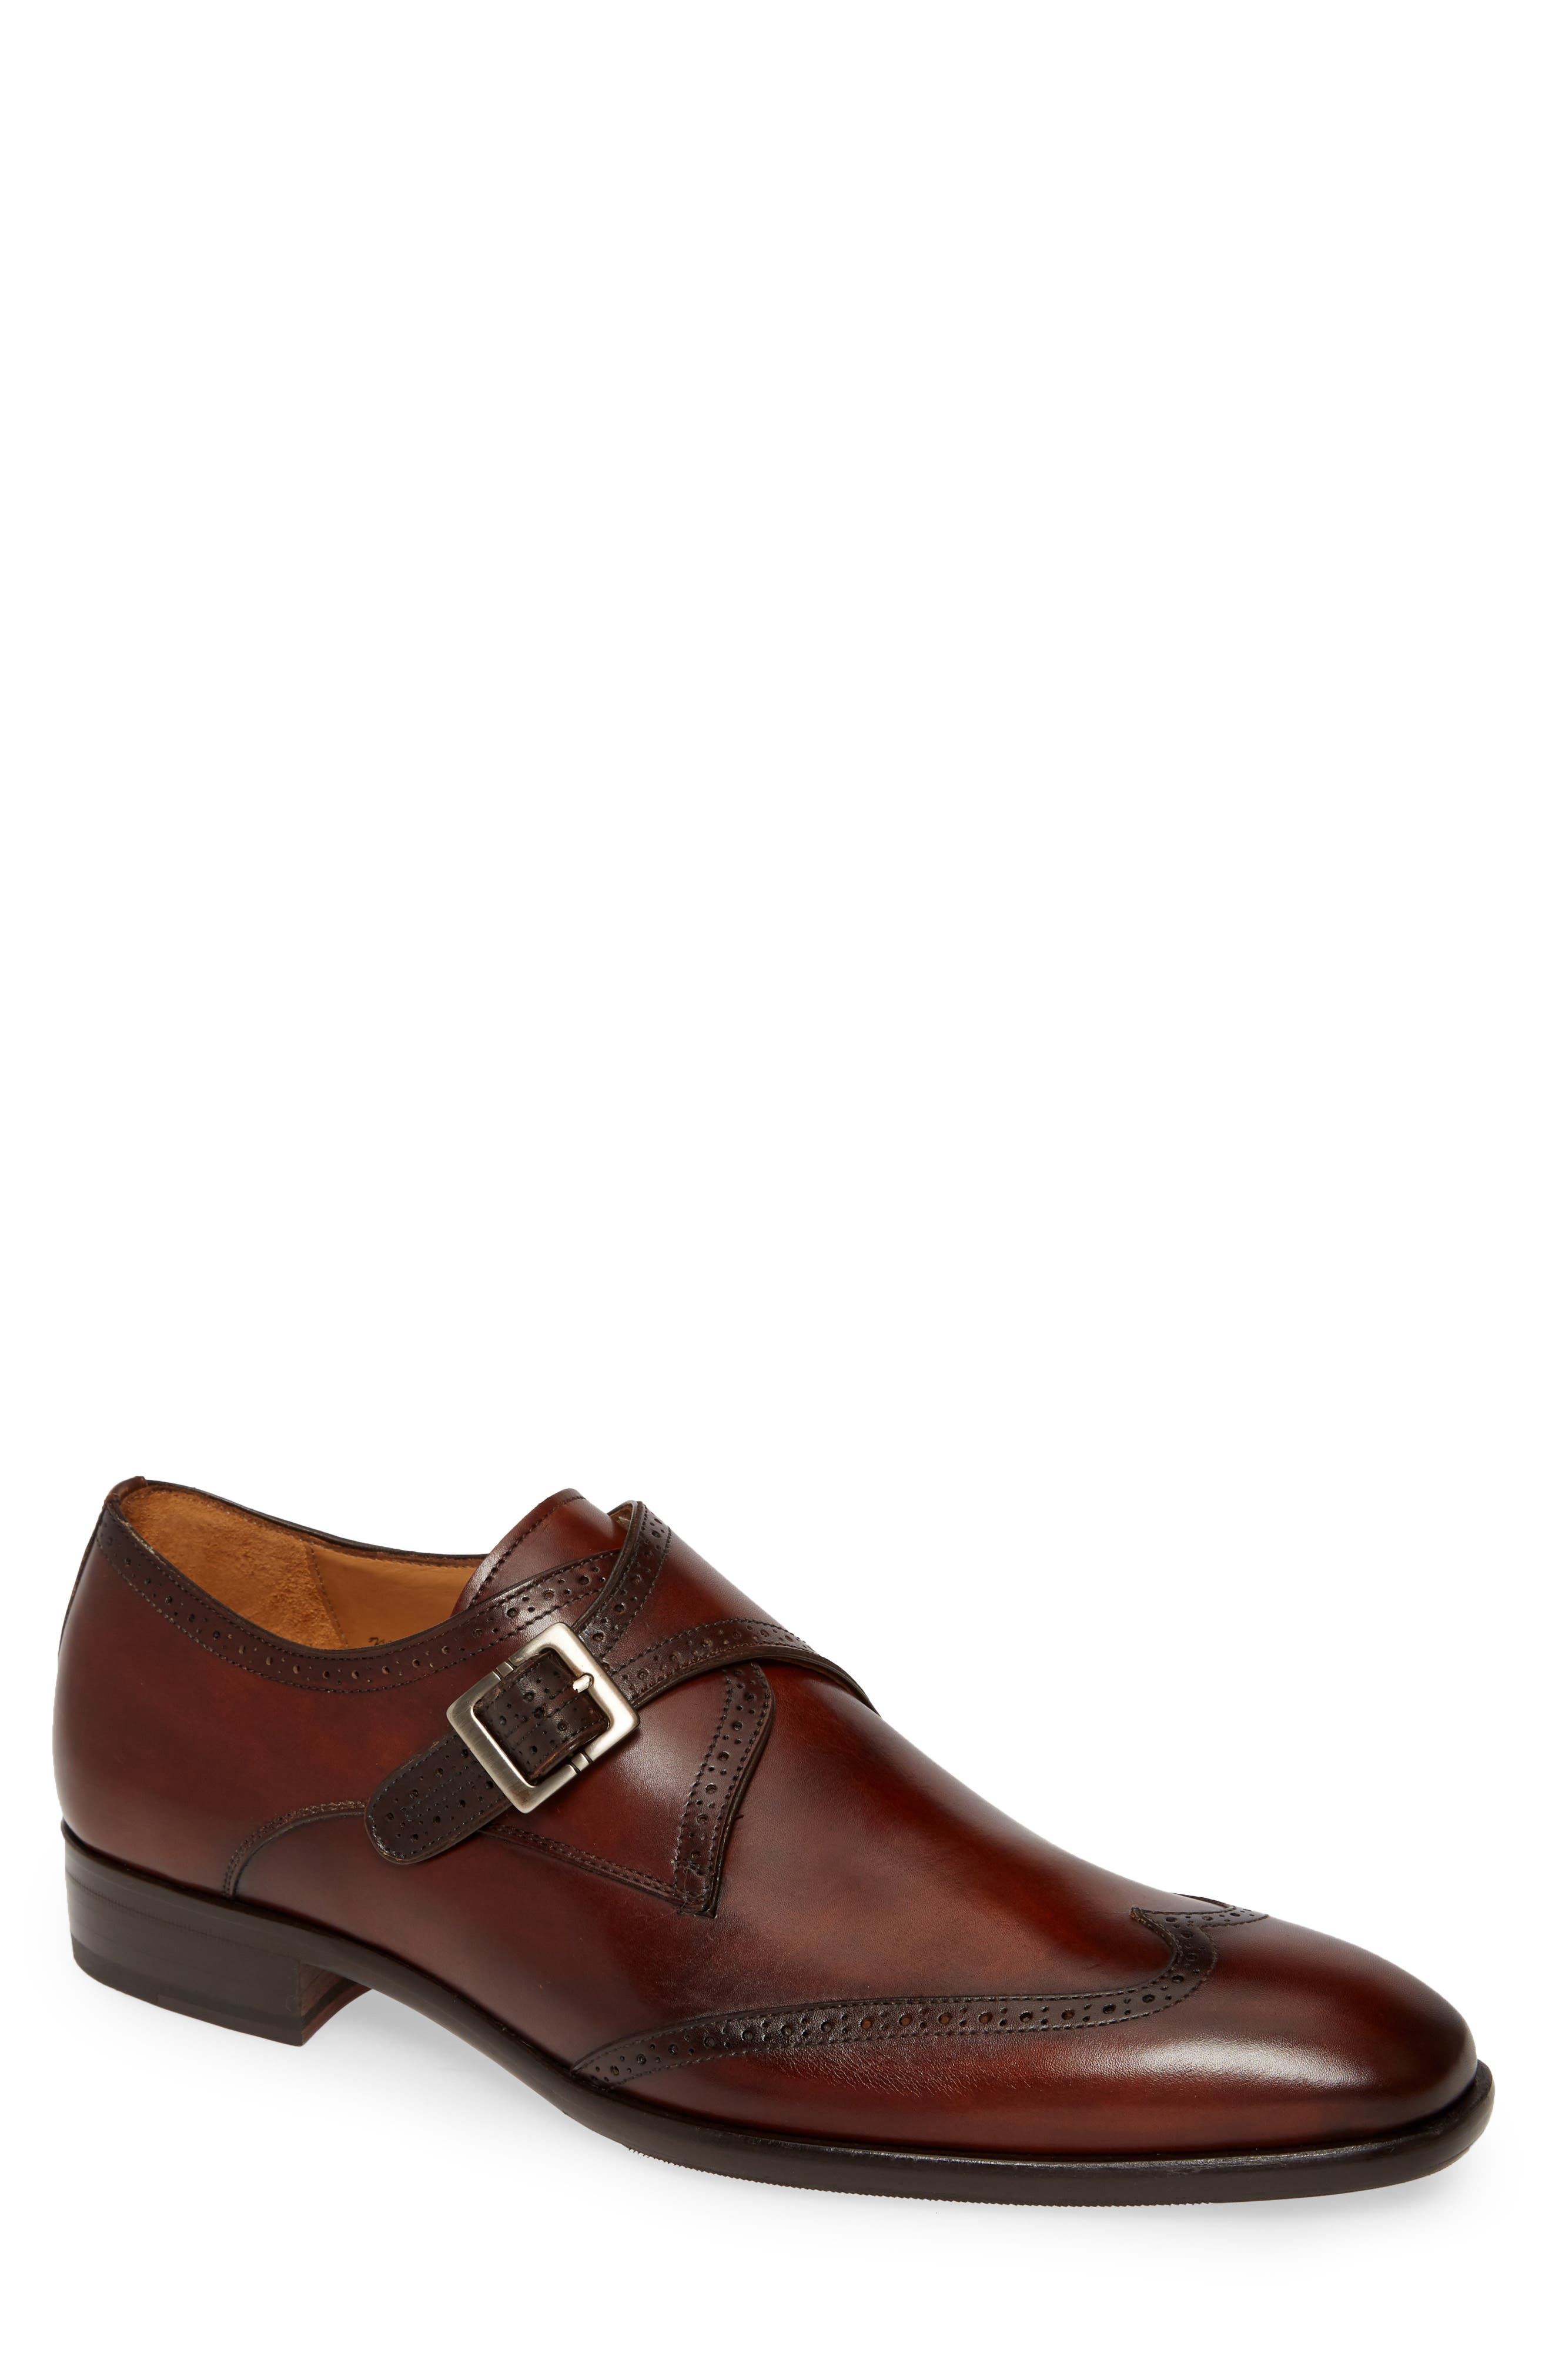 Forest Single Monk Strap Wingtip Shoe